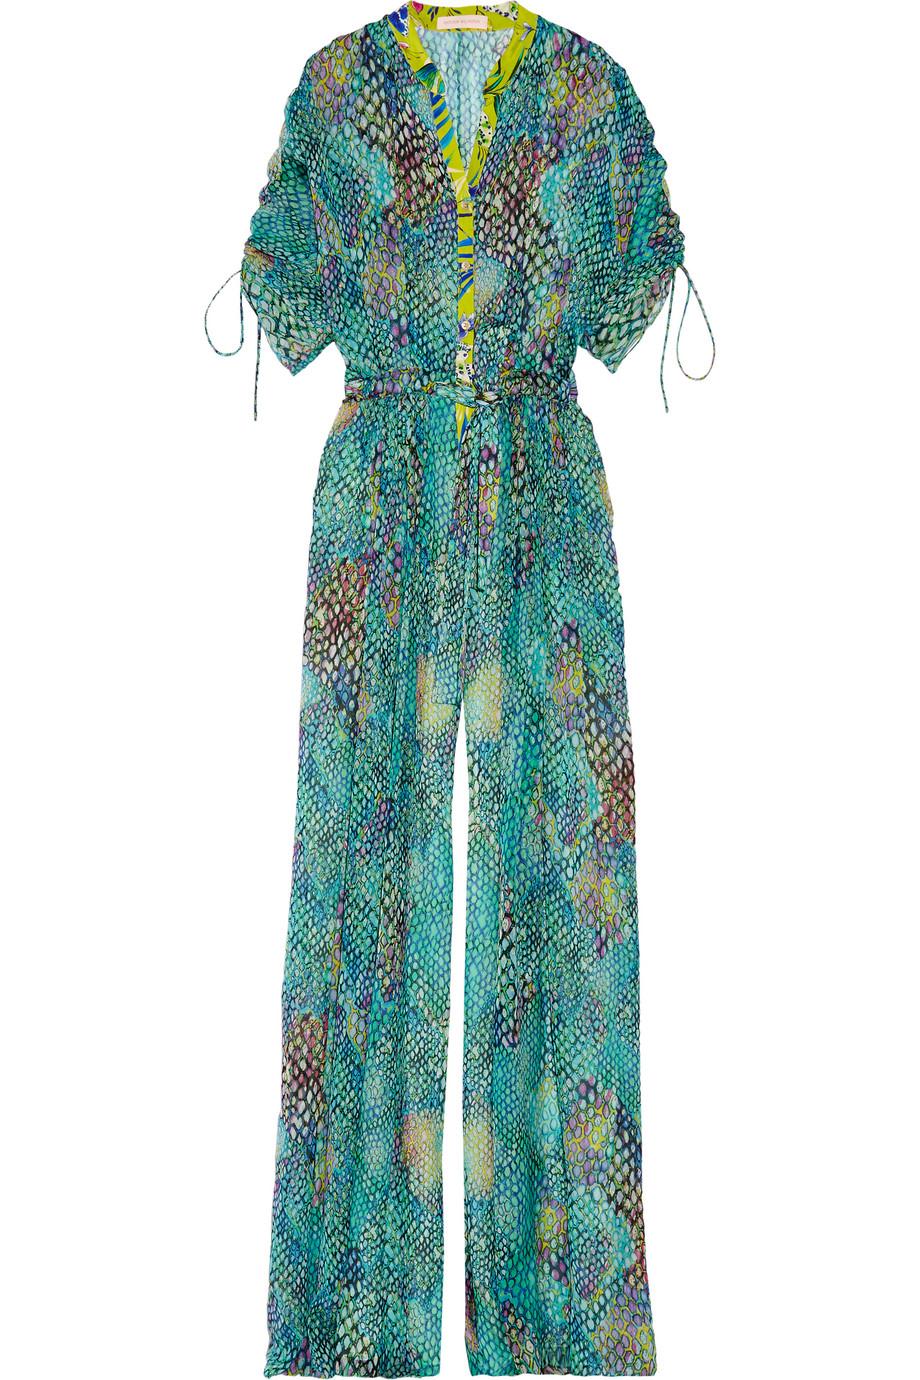 Printed Silk-Chiffon Jumpsuit, Matthew Williamson, Teal, Women's, Size: 8